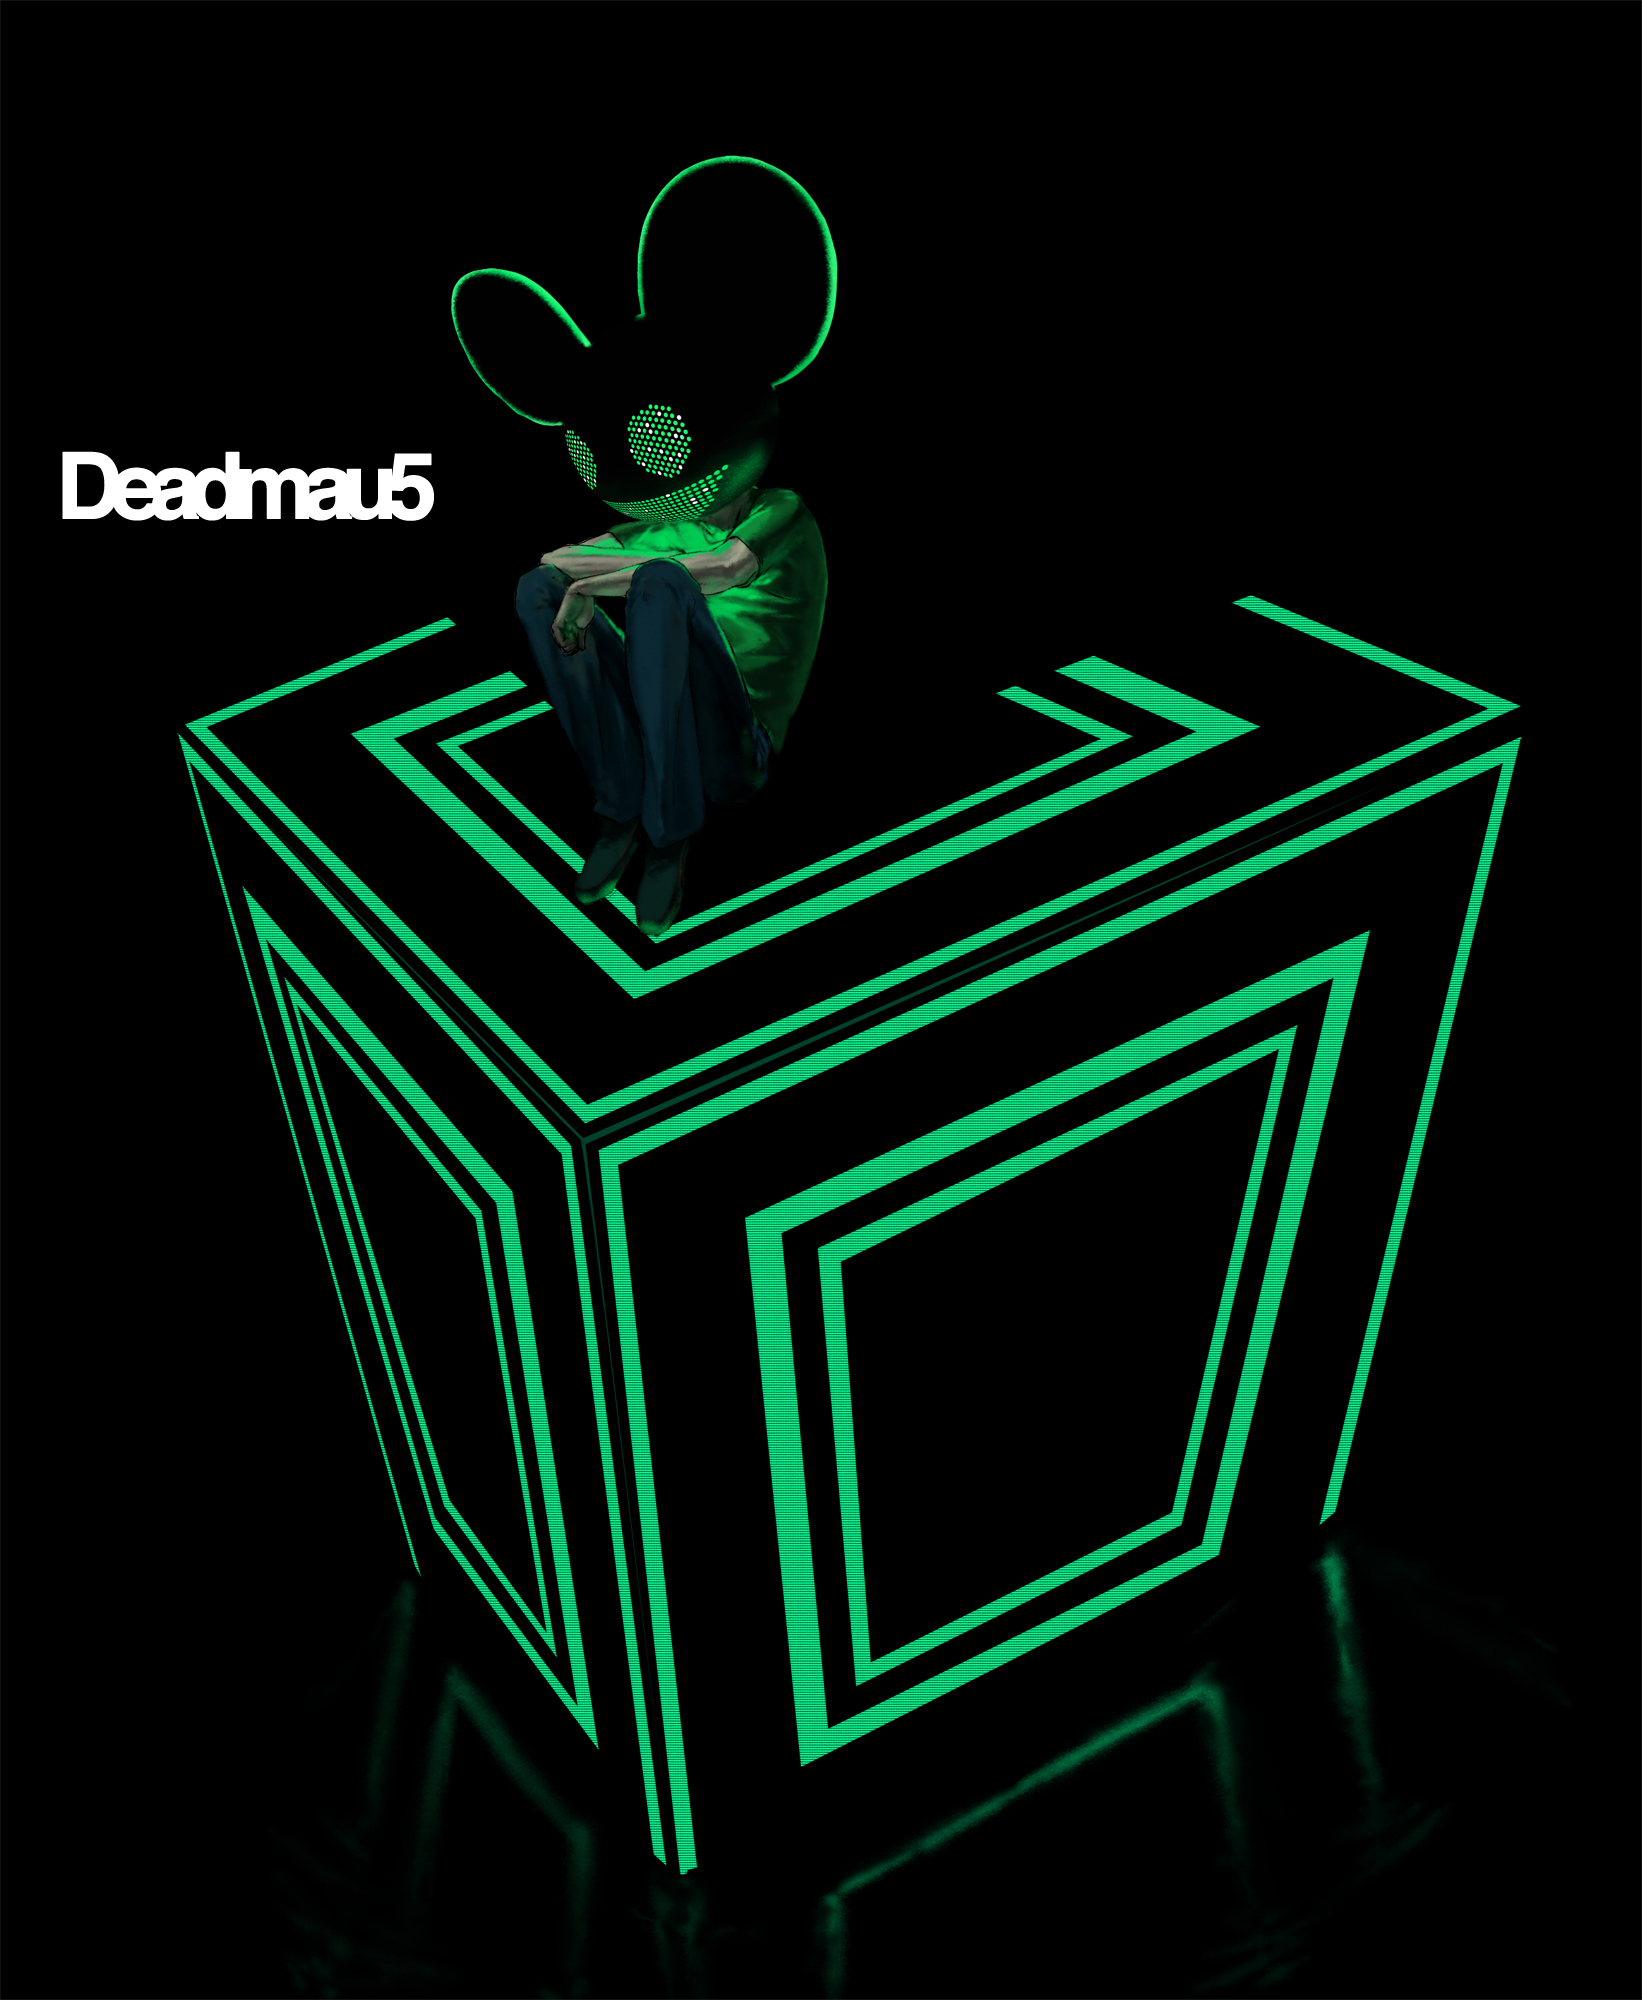 deadmau5 green wallpaper - photo #23